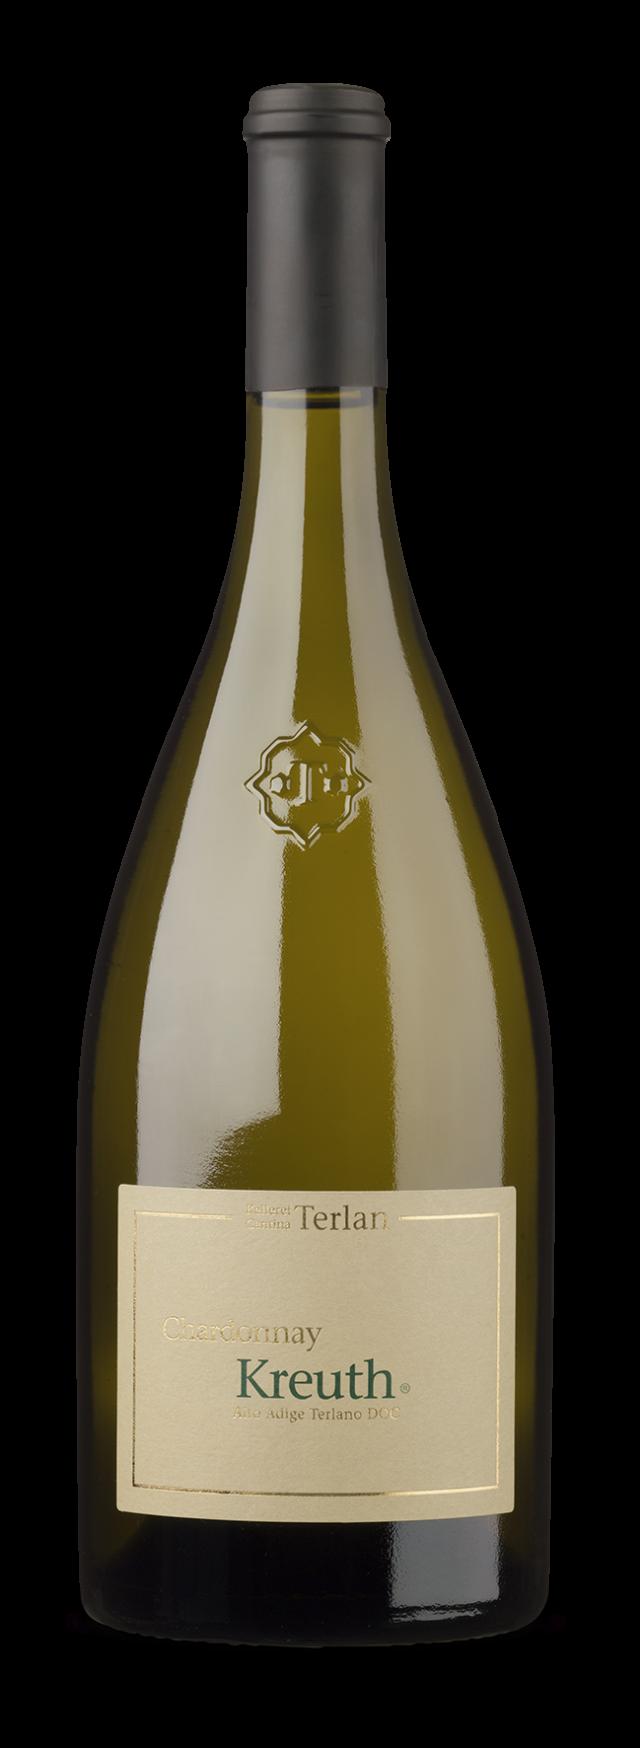 Terlan - 2020 Chardonnay Kreuth DOC